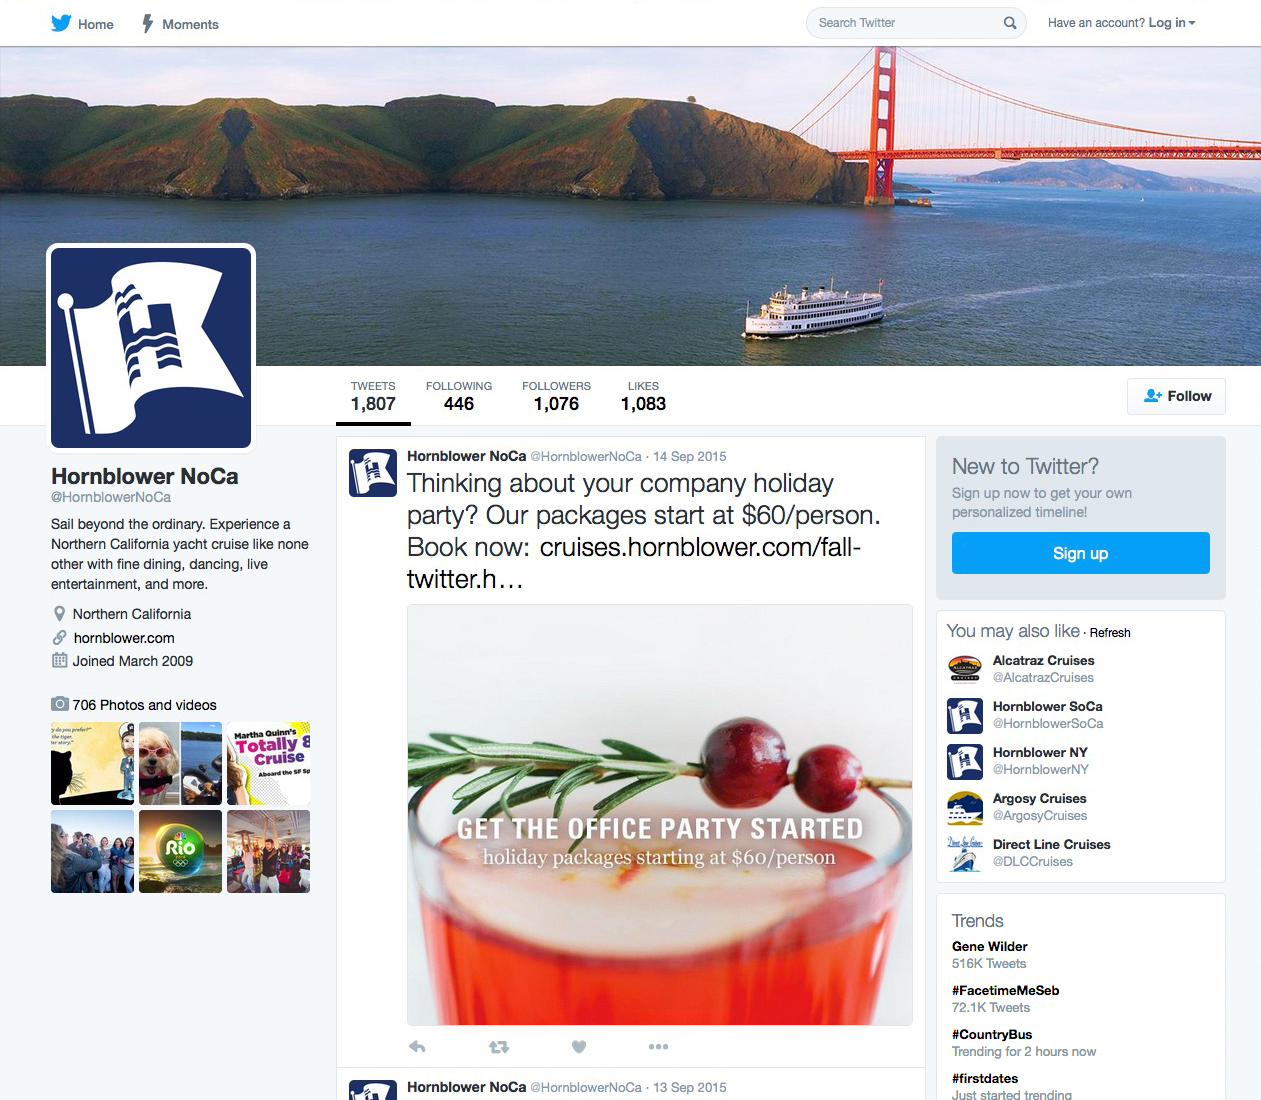 HB-Twitter-Company-Parties.jpg